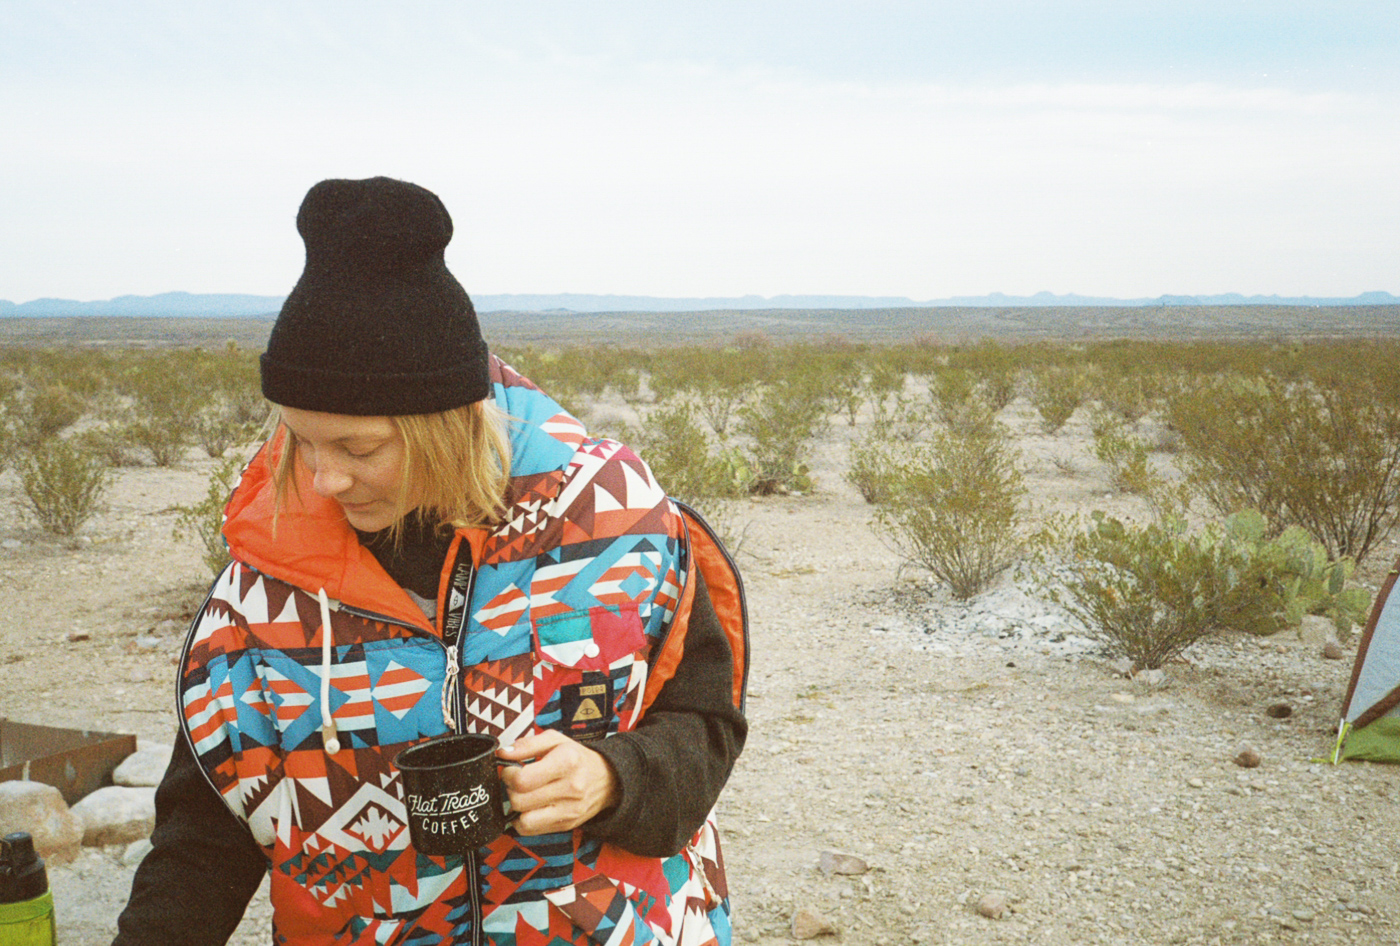 film 35mm lomo olympus hike camp big bend texas america yall pawlowski poler stuff